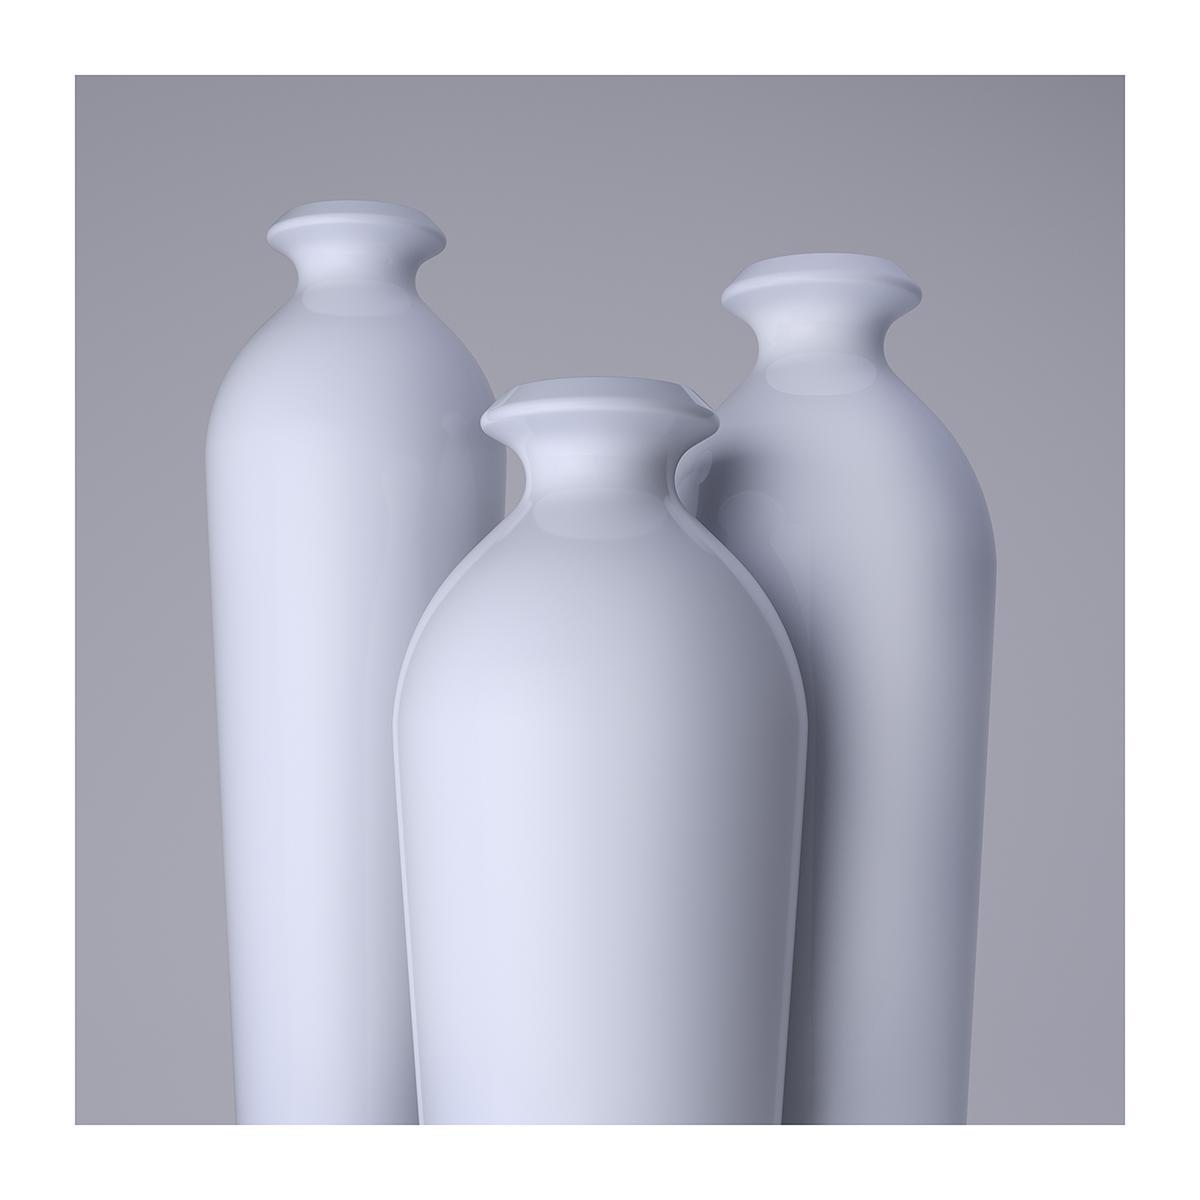 235 Lsdr TWHS Virtual Ceramics II 005 - 2021 - La simplicité du regard. This was HomoSapiens. Virtual Ceramics. II